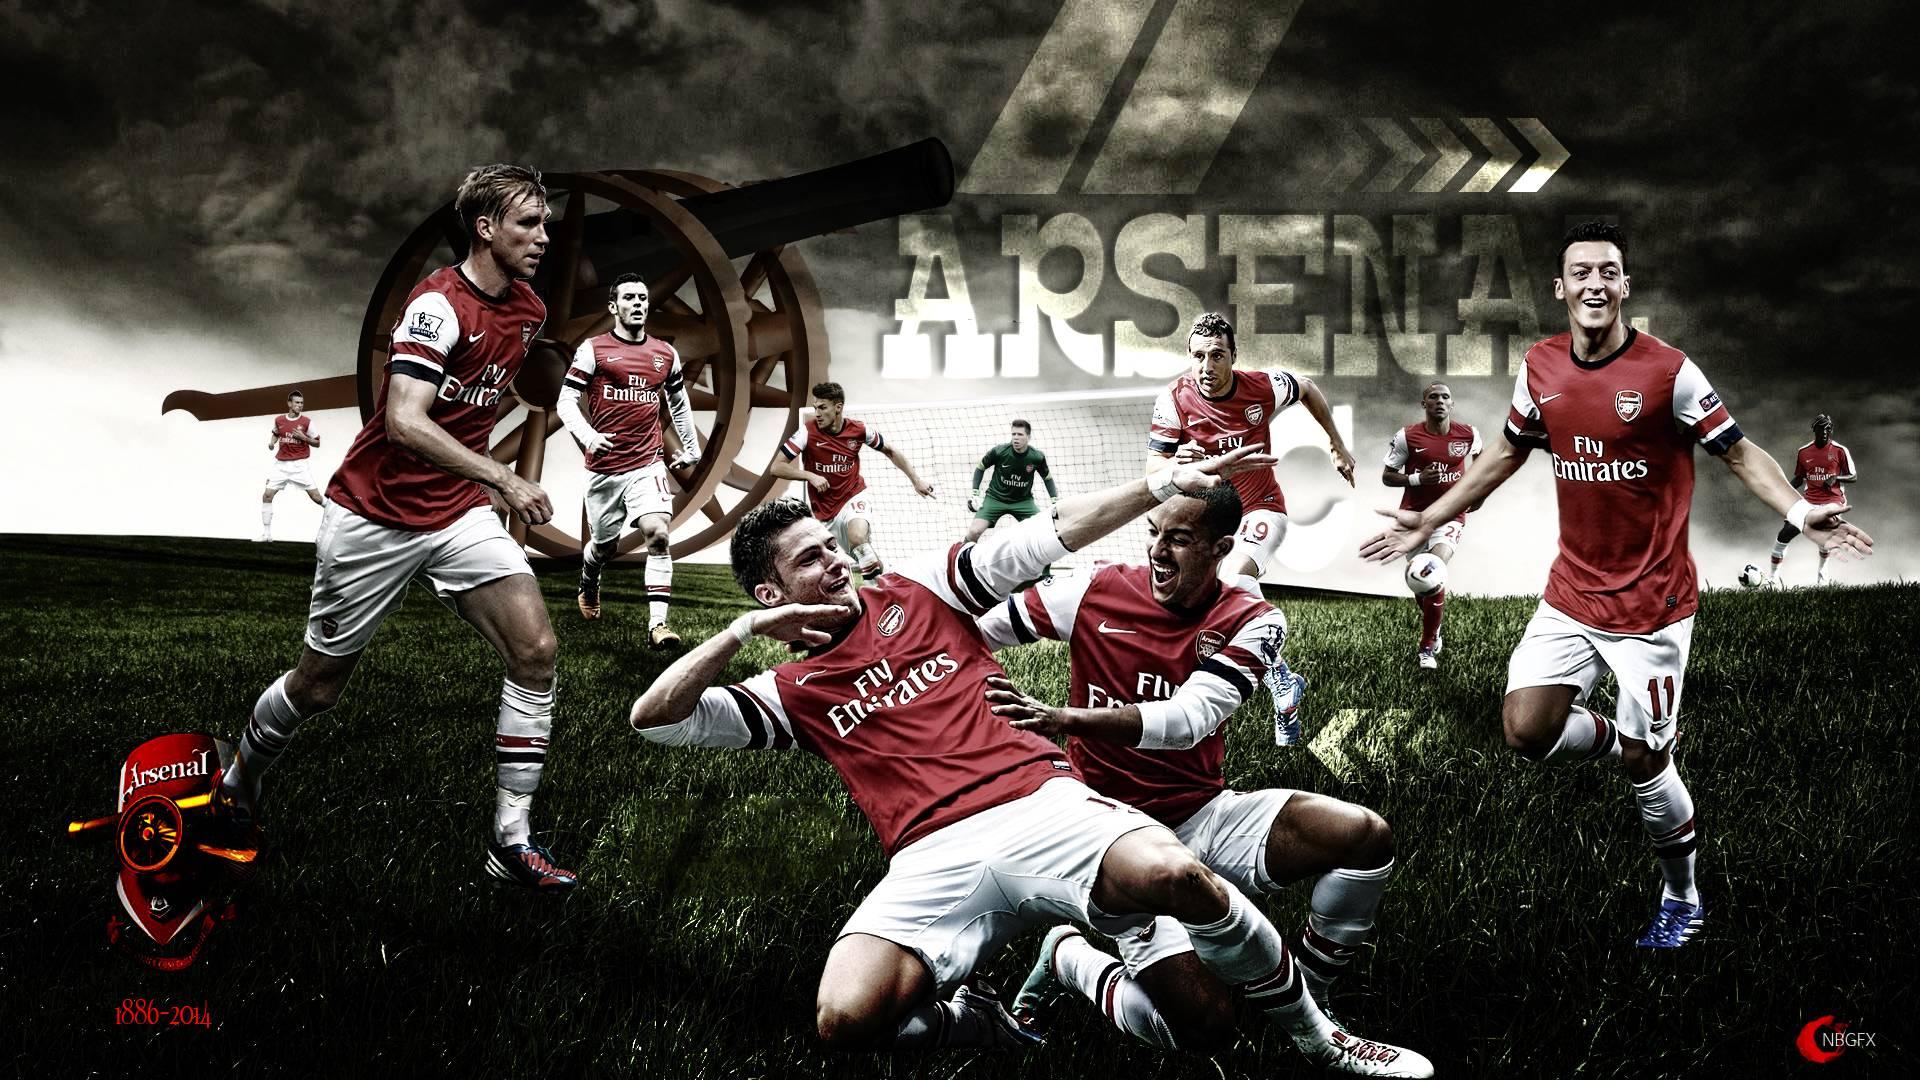 arsenal logo wallpapers 2015 wallpaper cave